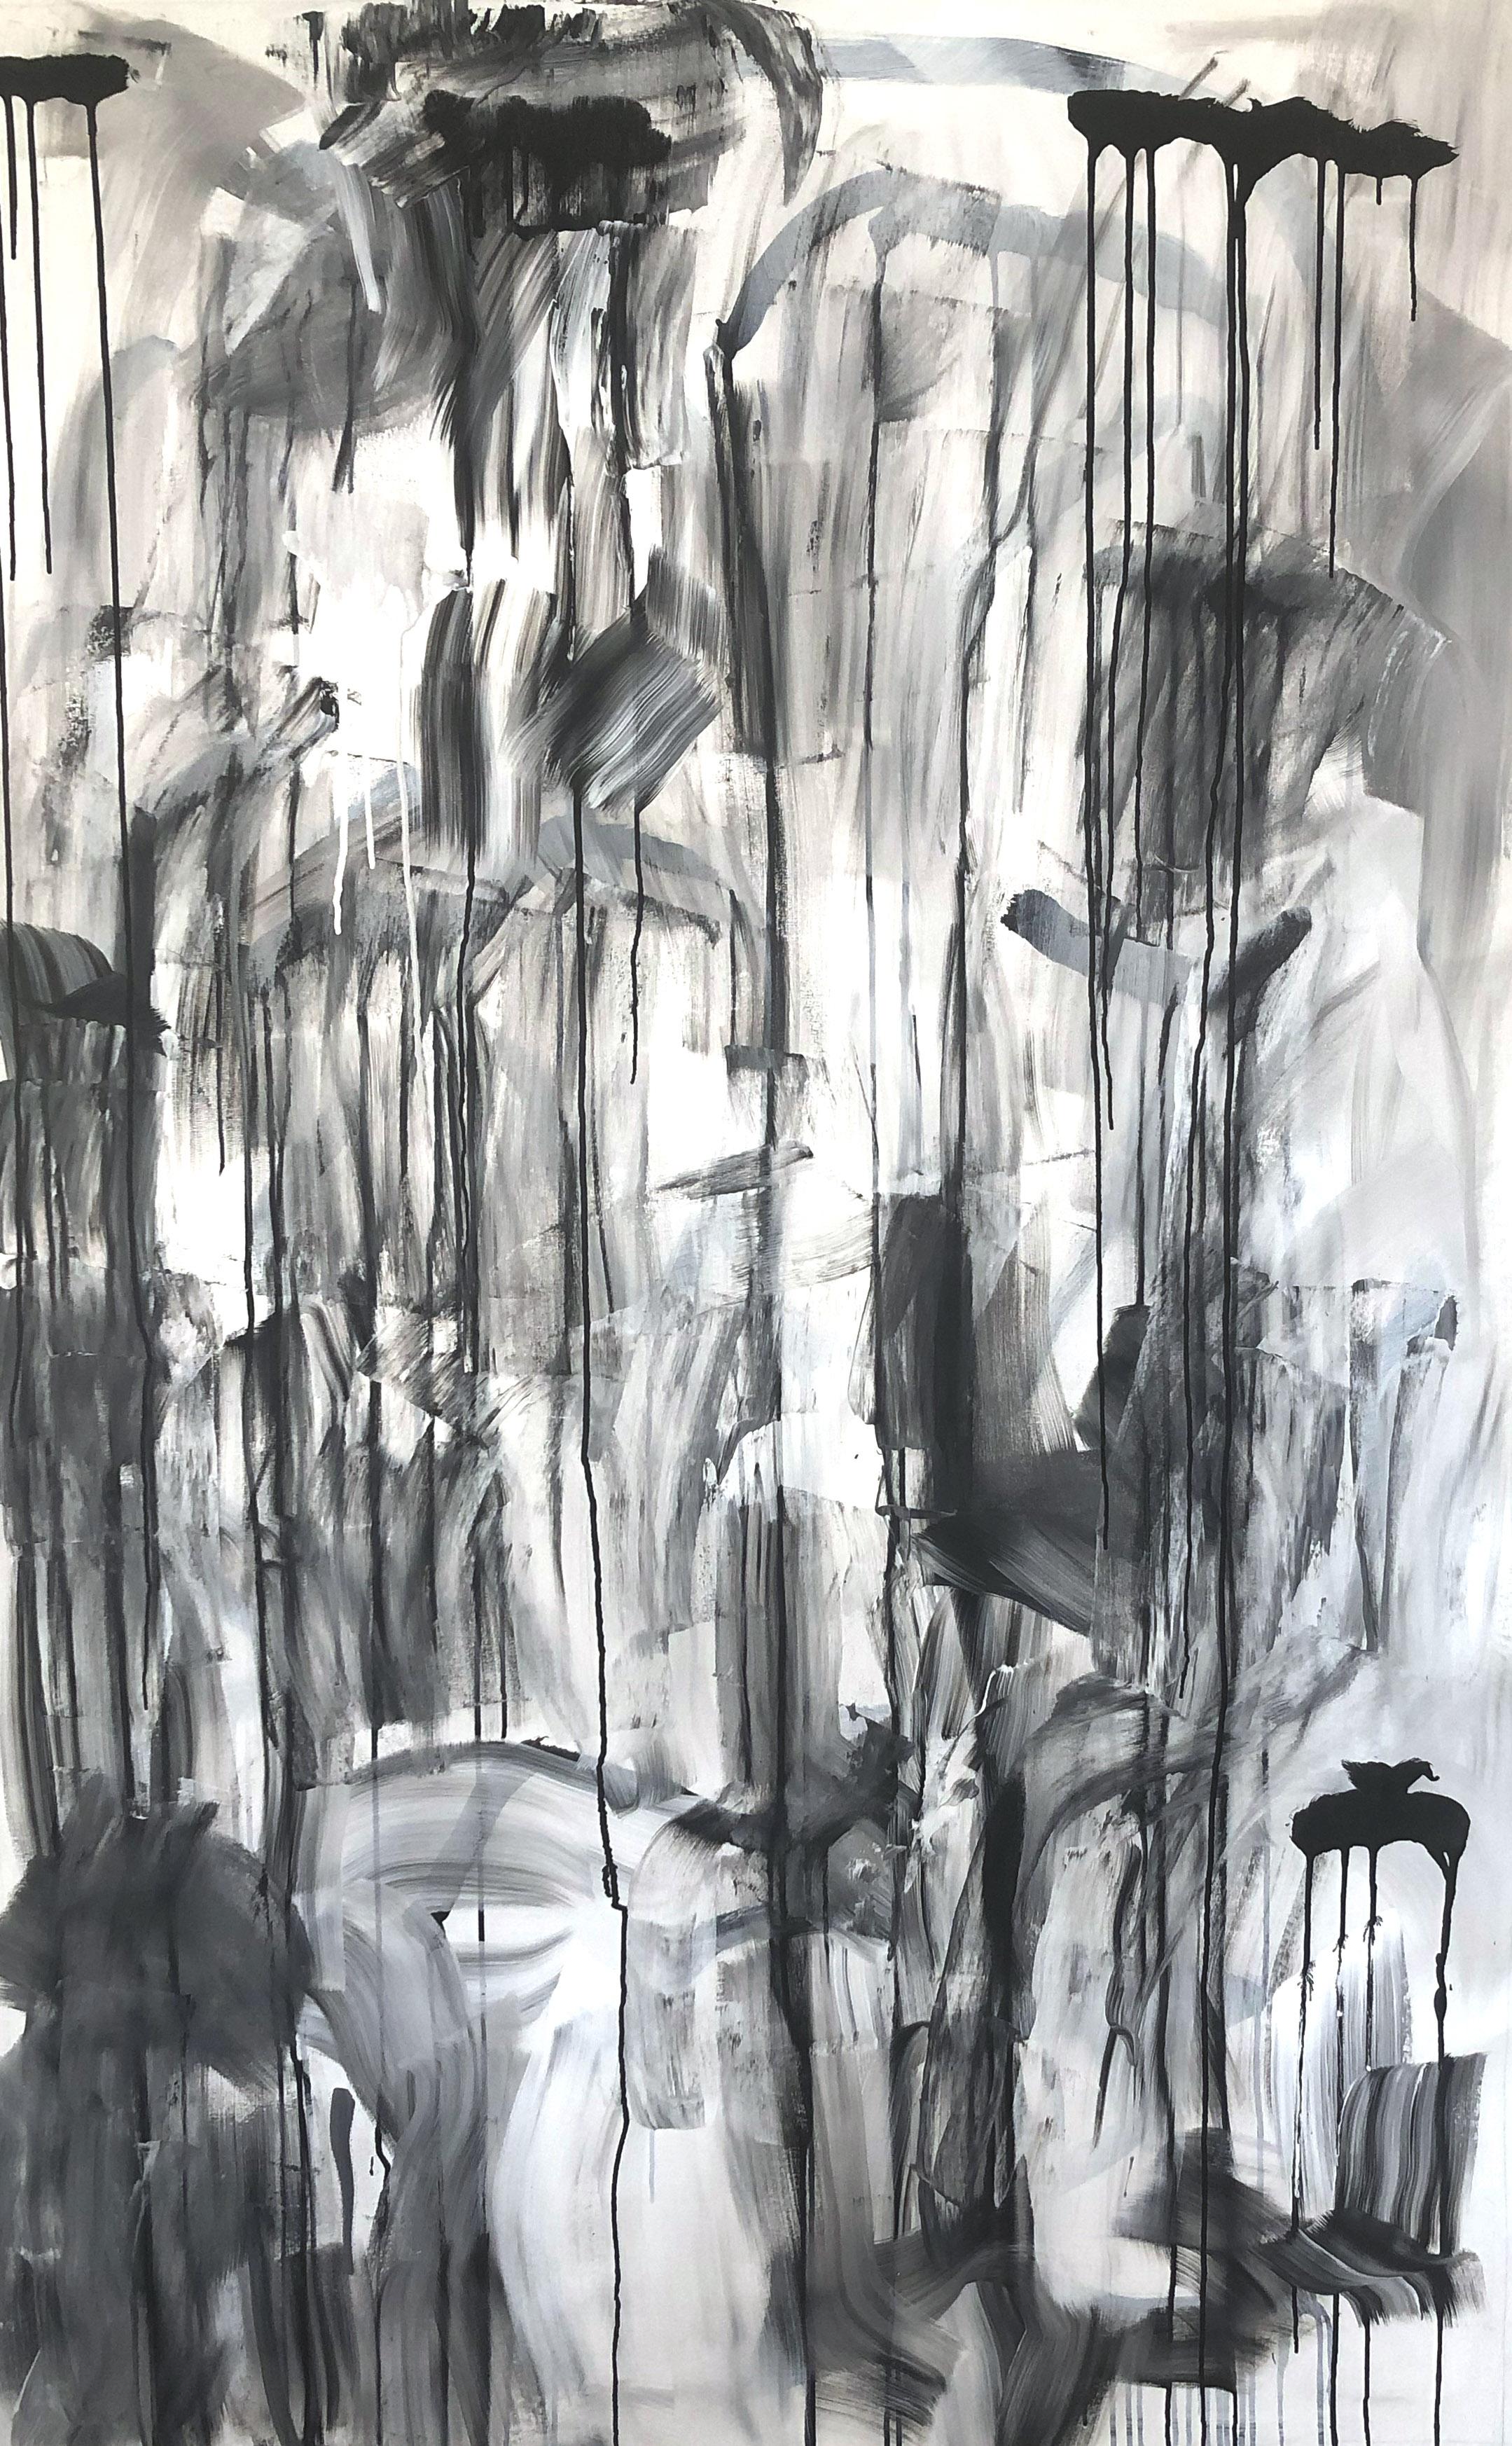 Untitled VII